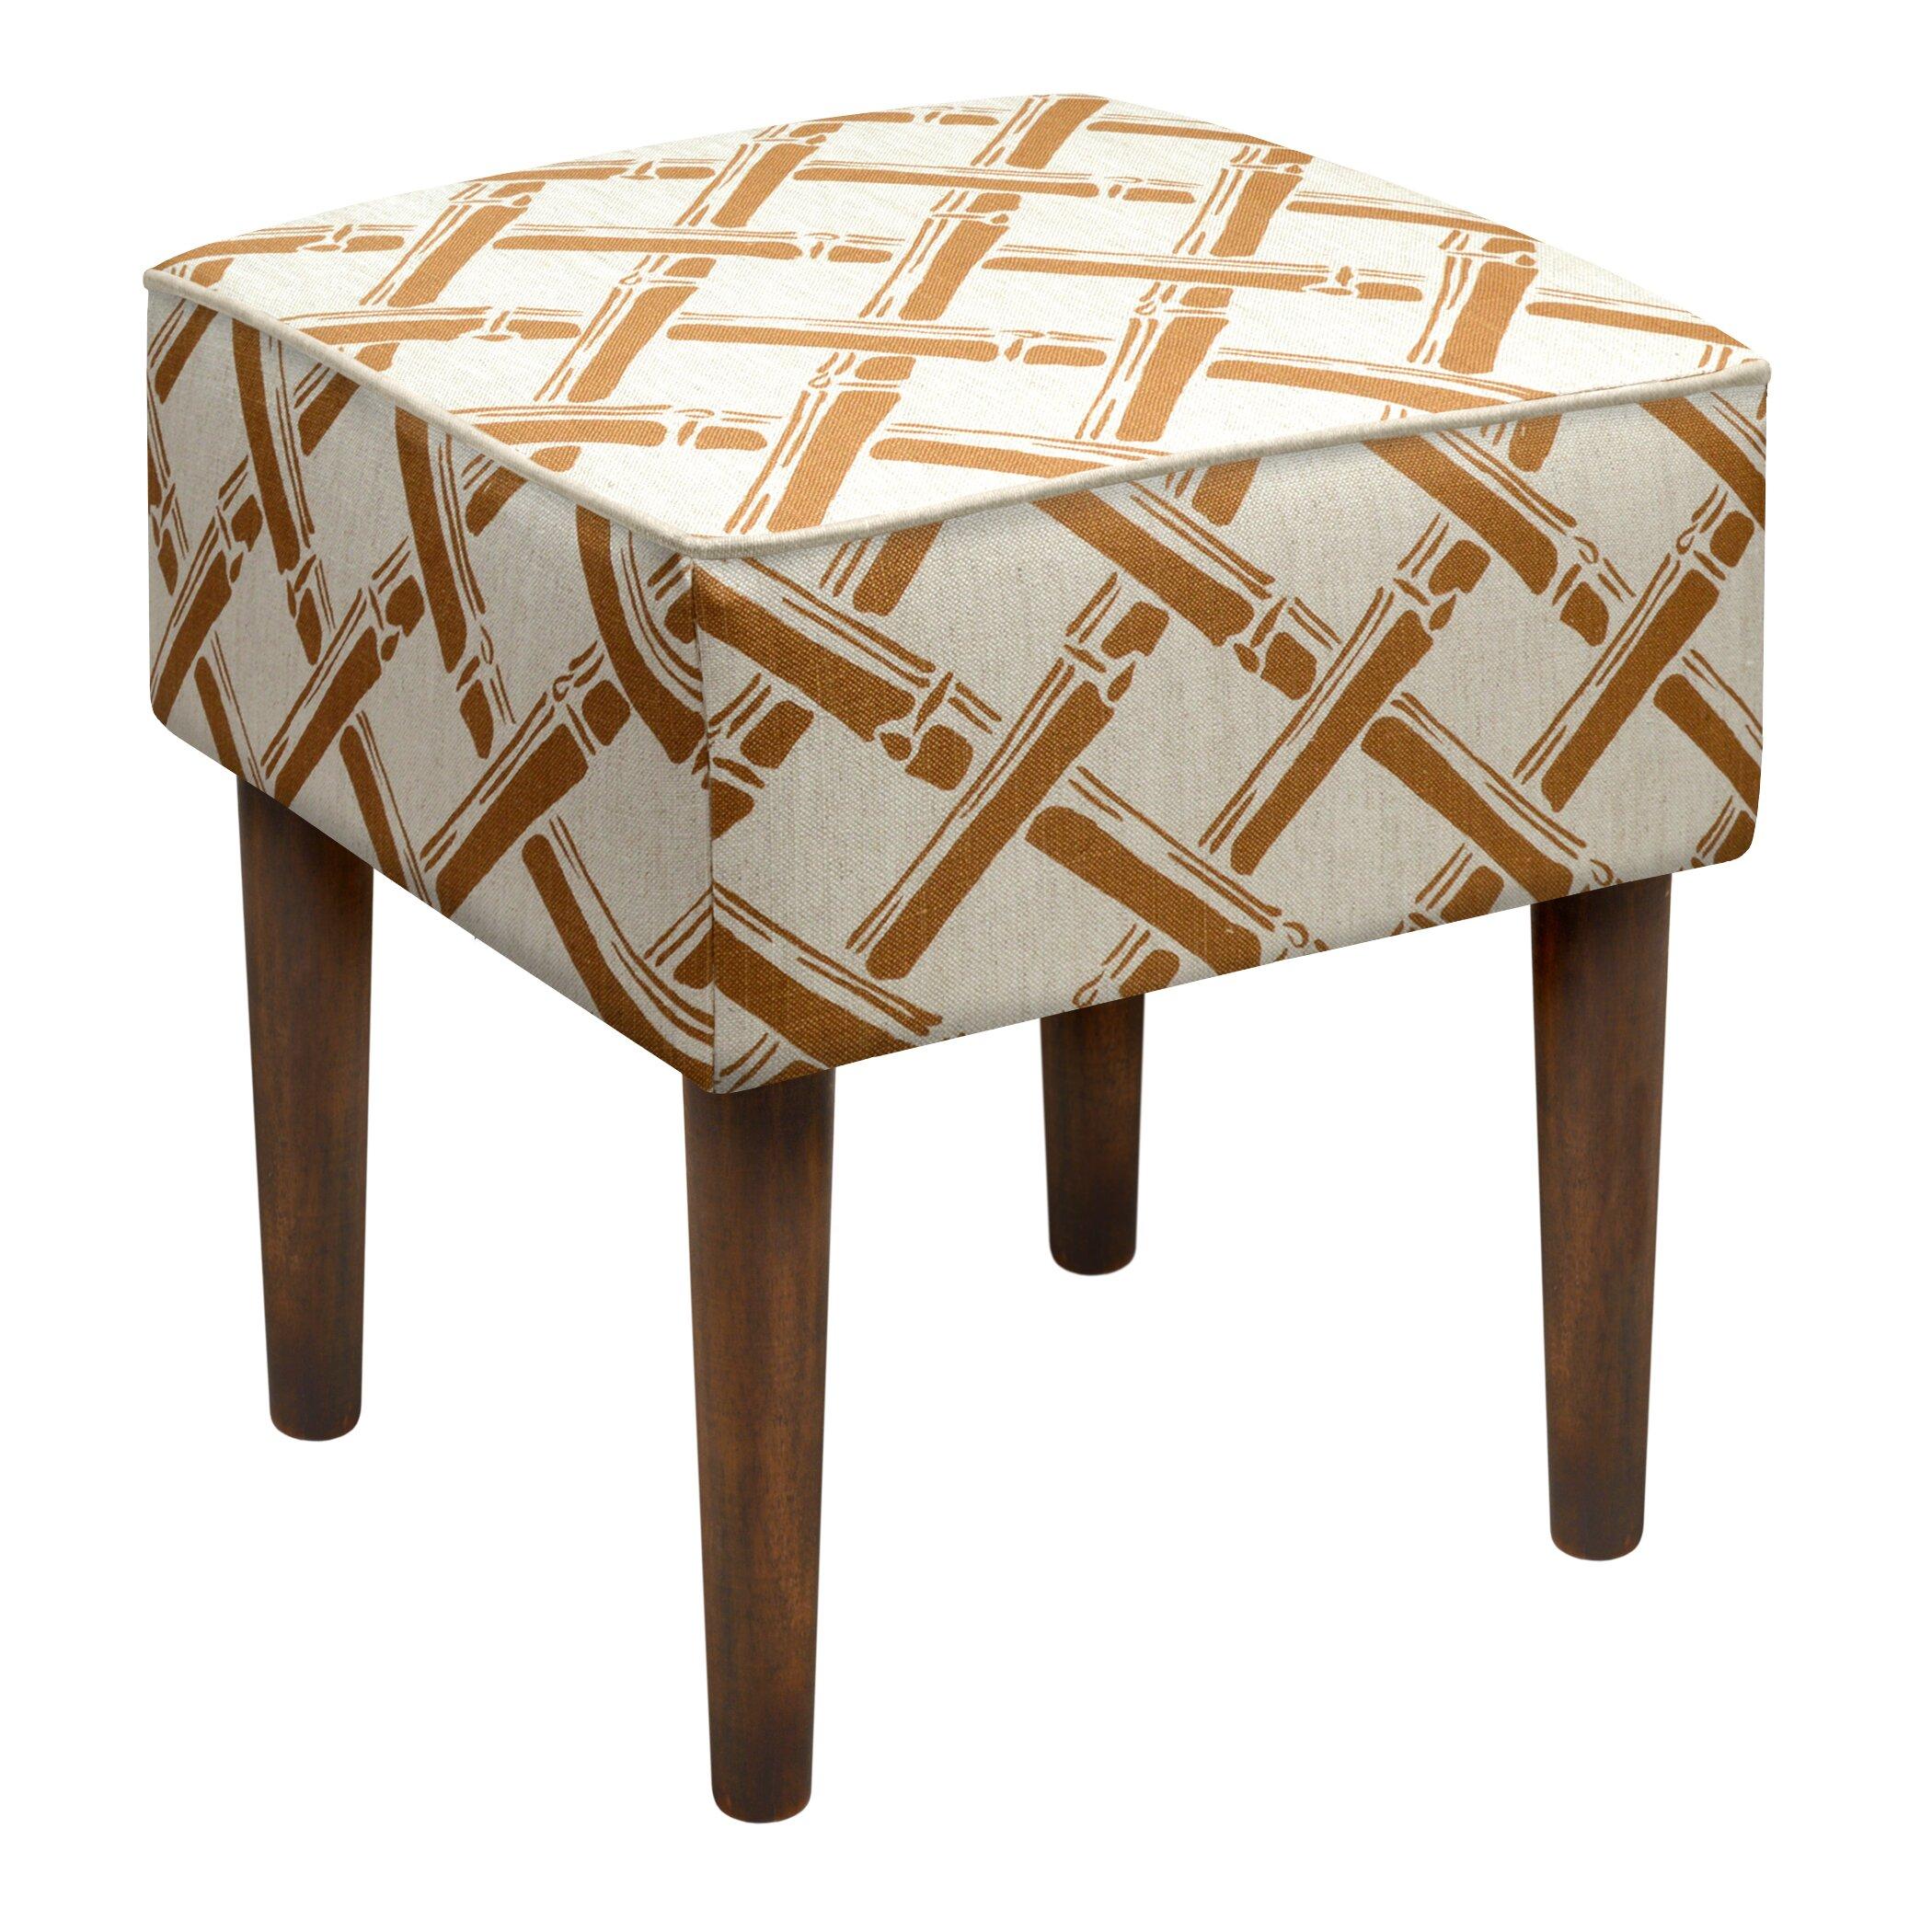 123 Creations Bamboo Trellis Upholstered Vanity Stool